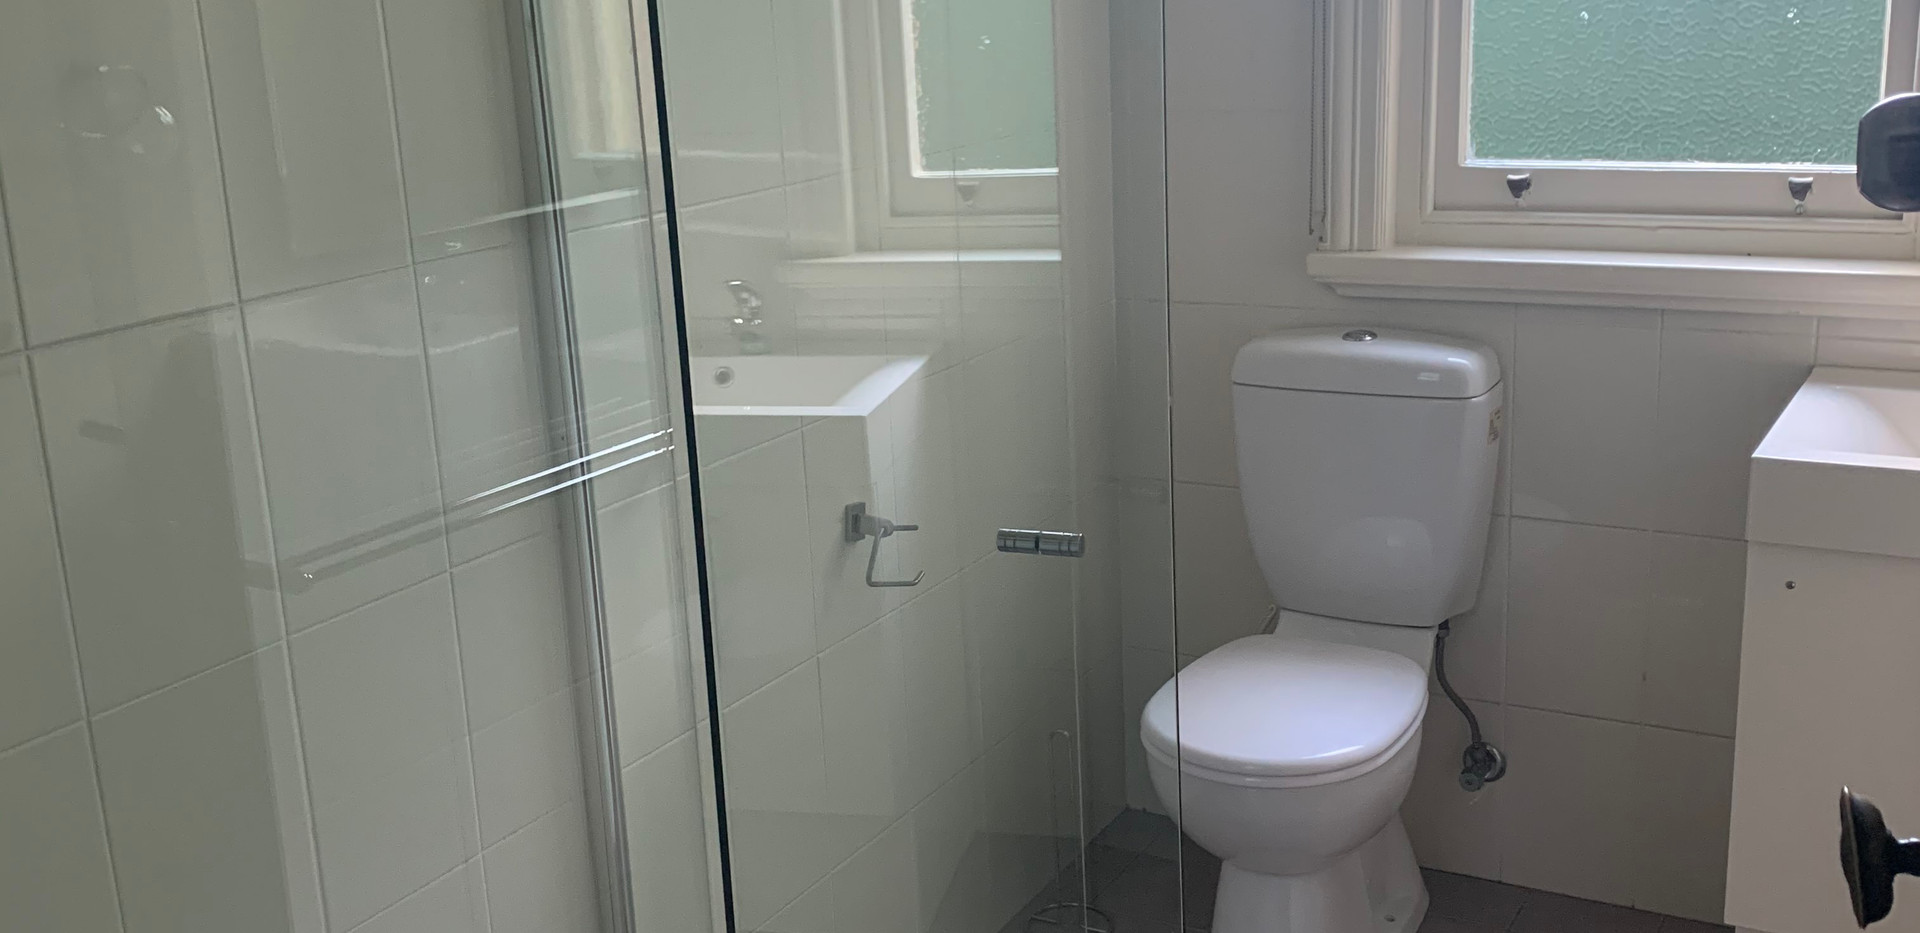 front bathroom inside.jpeg